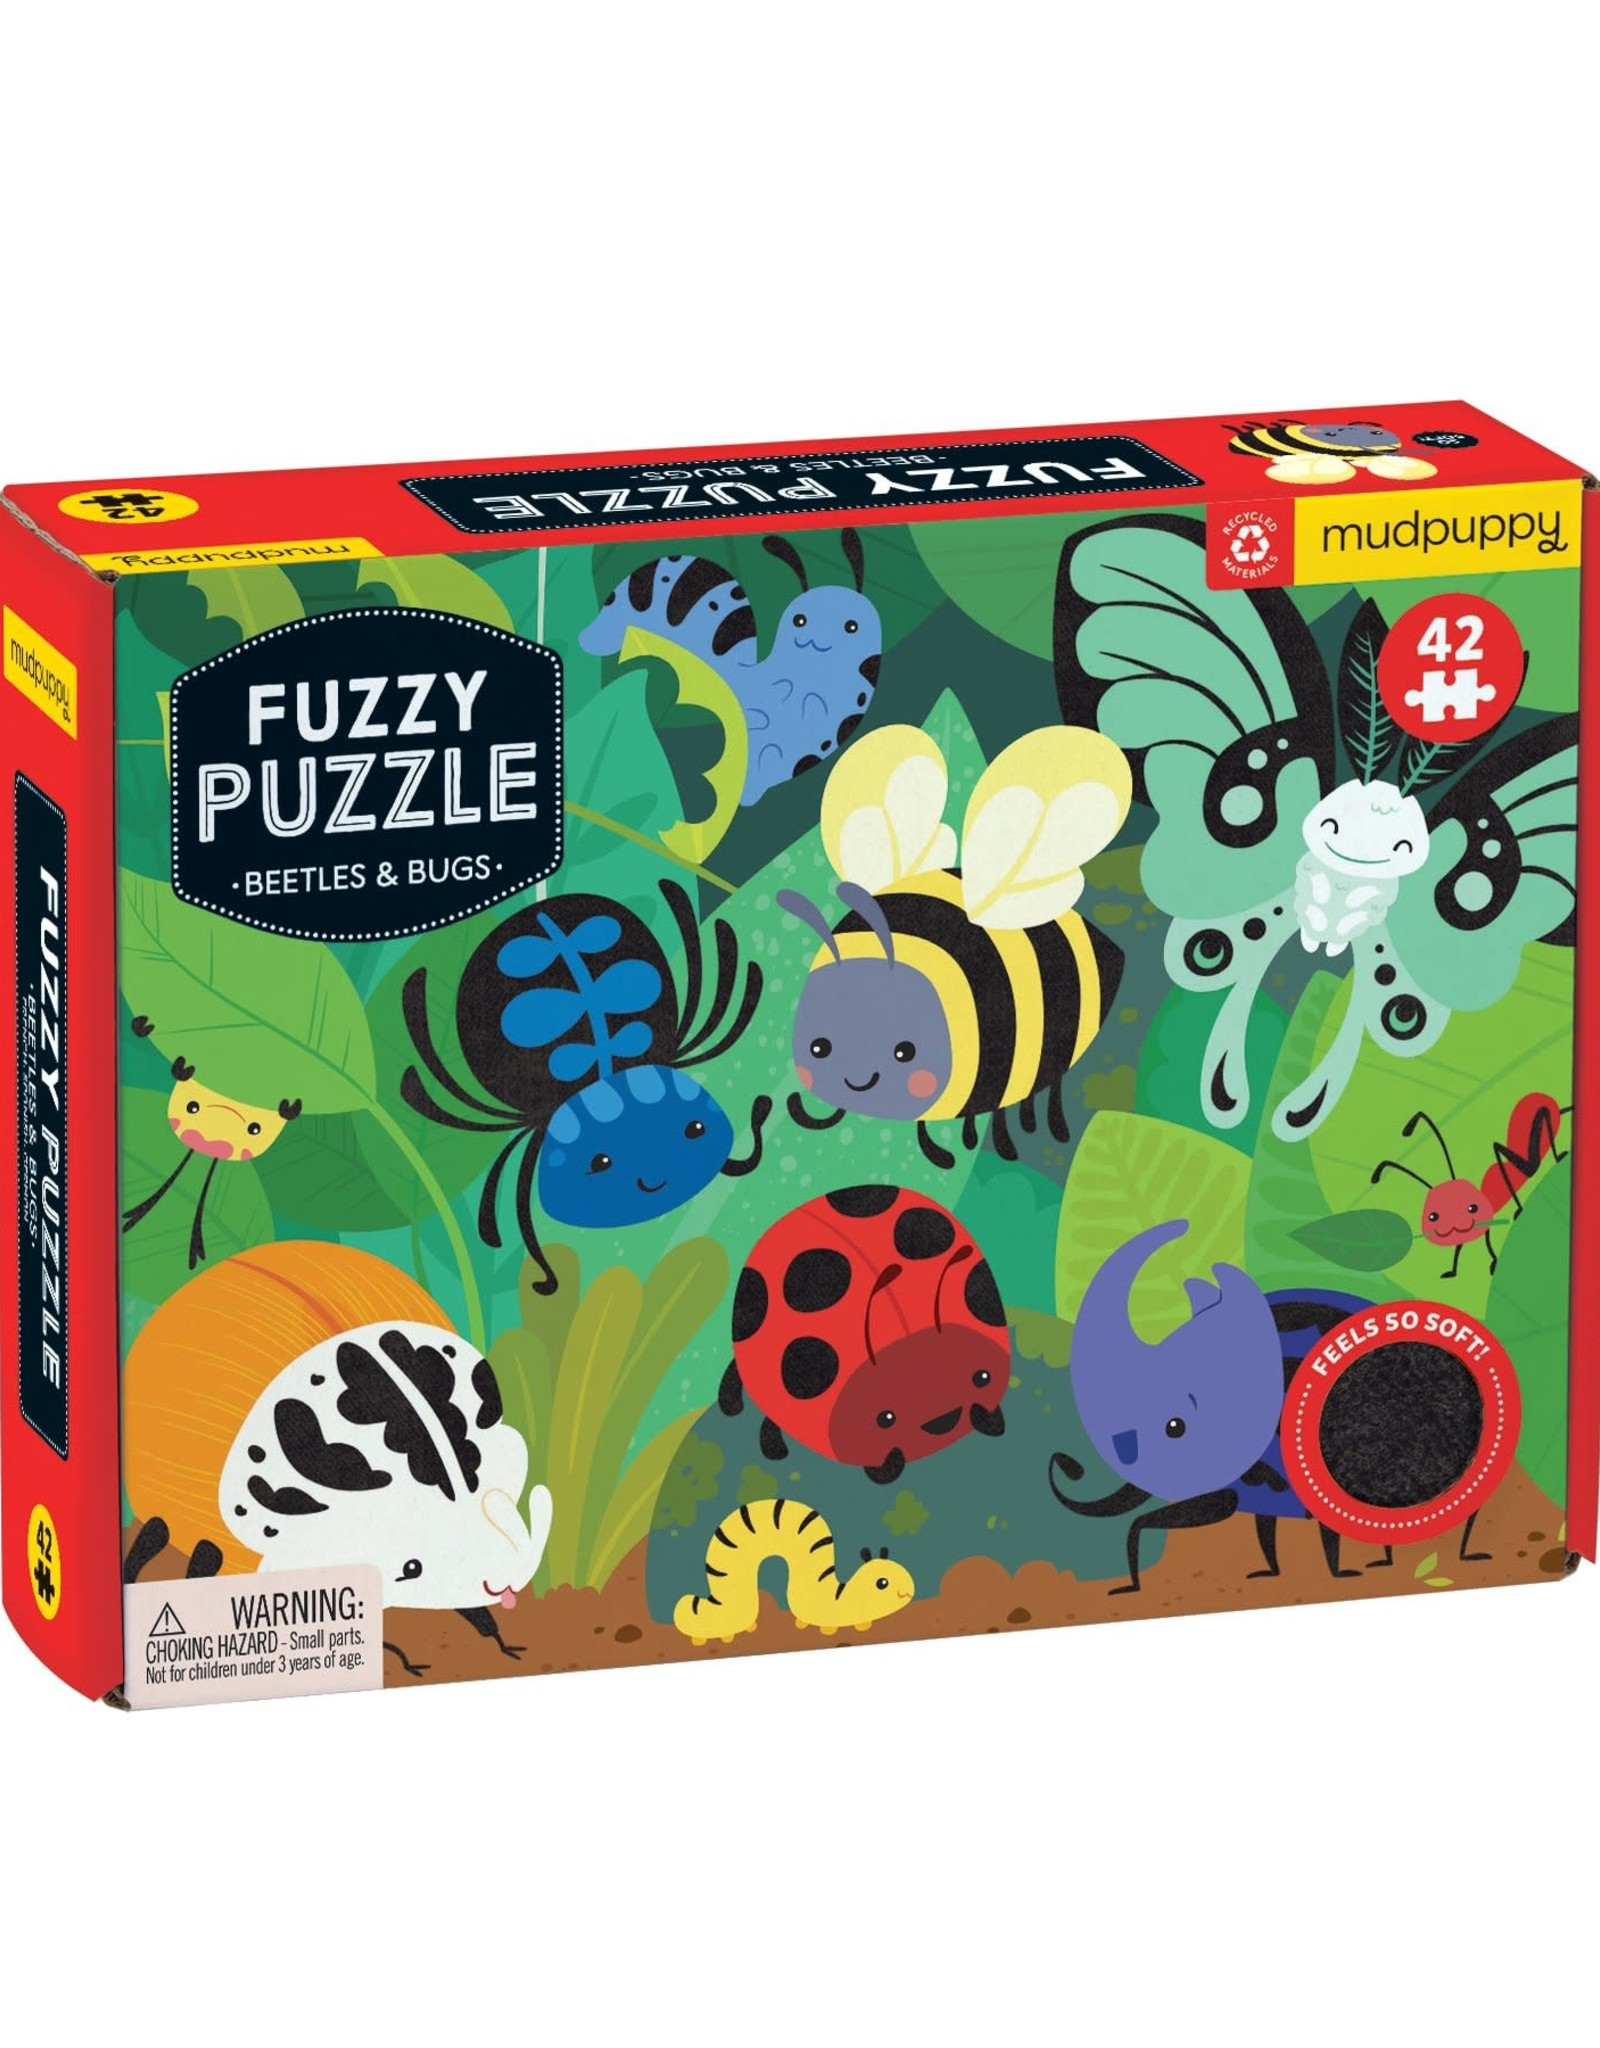 Mudpuppy Beatles & Bugs Fuzzy Puzzle